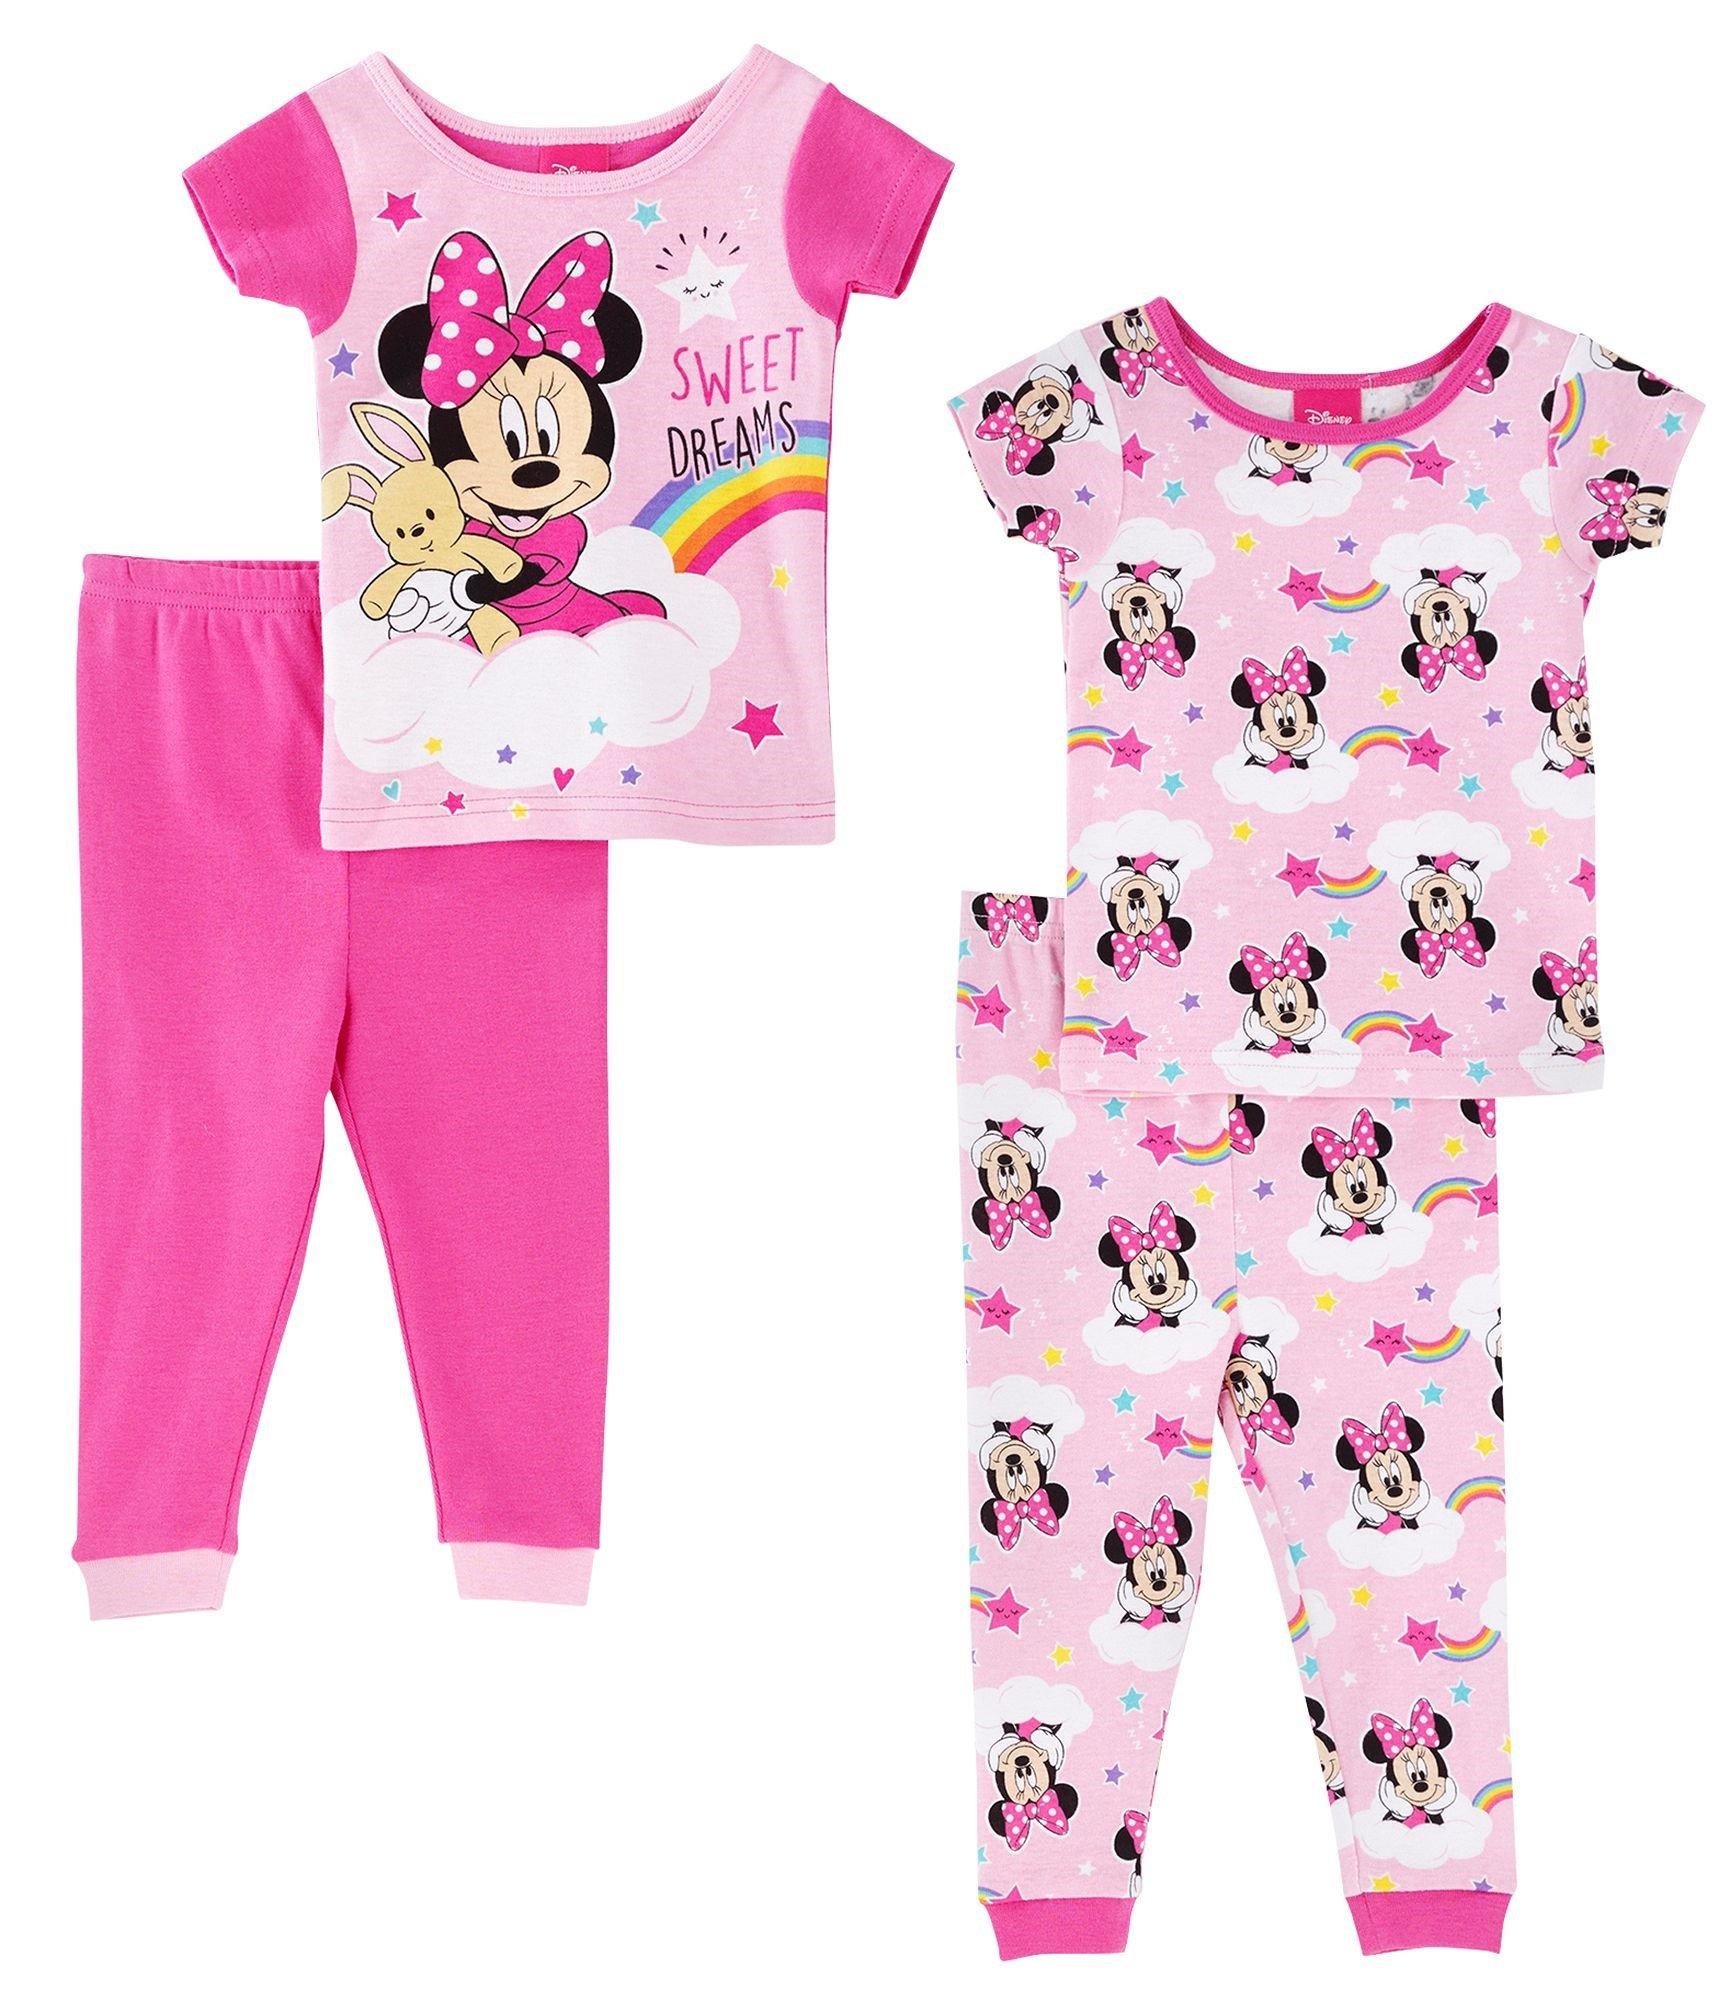 Disney Minnie Mouse Sweet Dreams Girls 4 Piece Pajama Set, Toddlers Size 4T